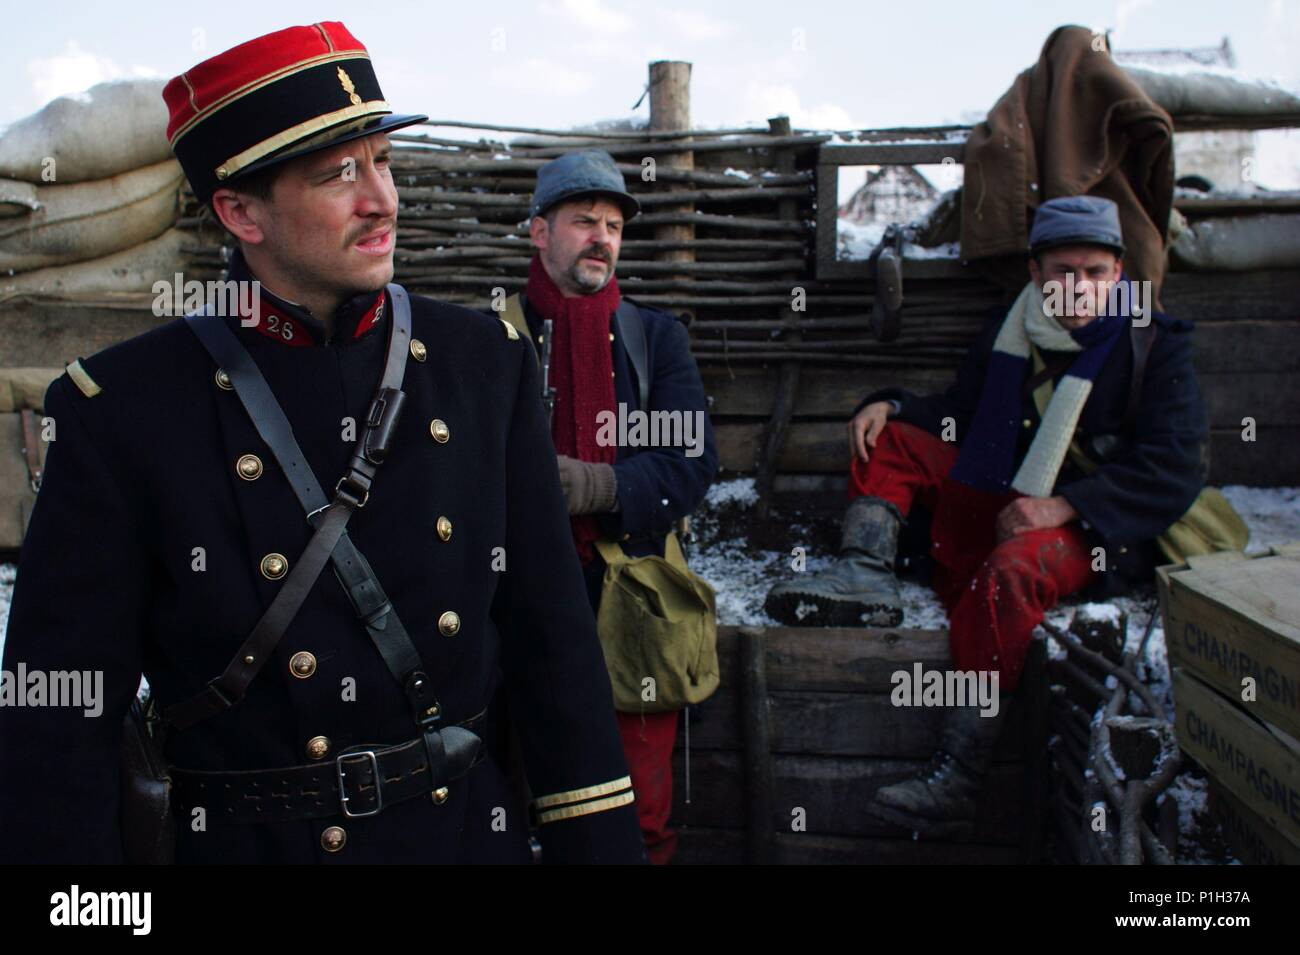 Film Joyeux Noel De Christian Carion.Original Film Title Joyeux Noel English Title Merry